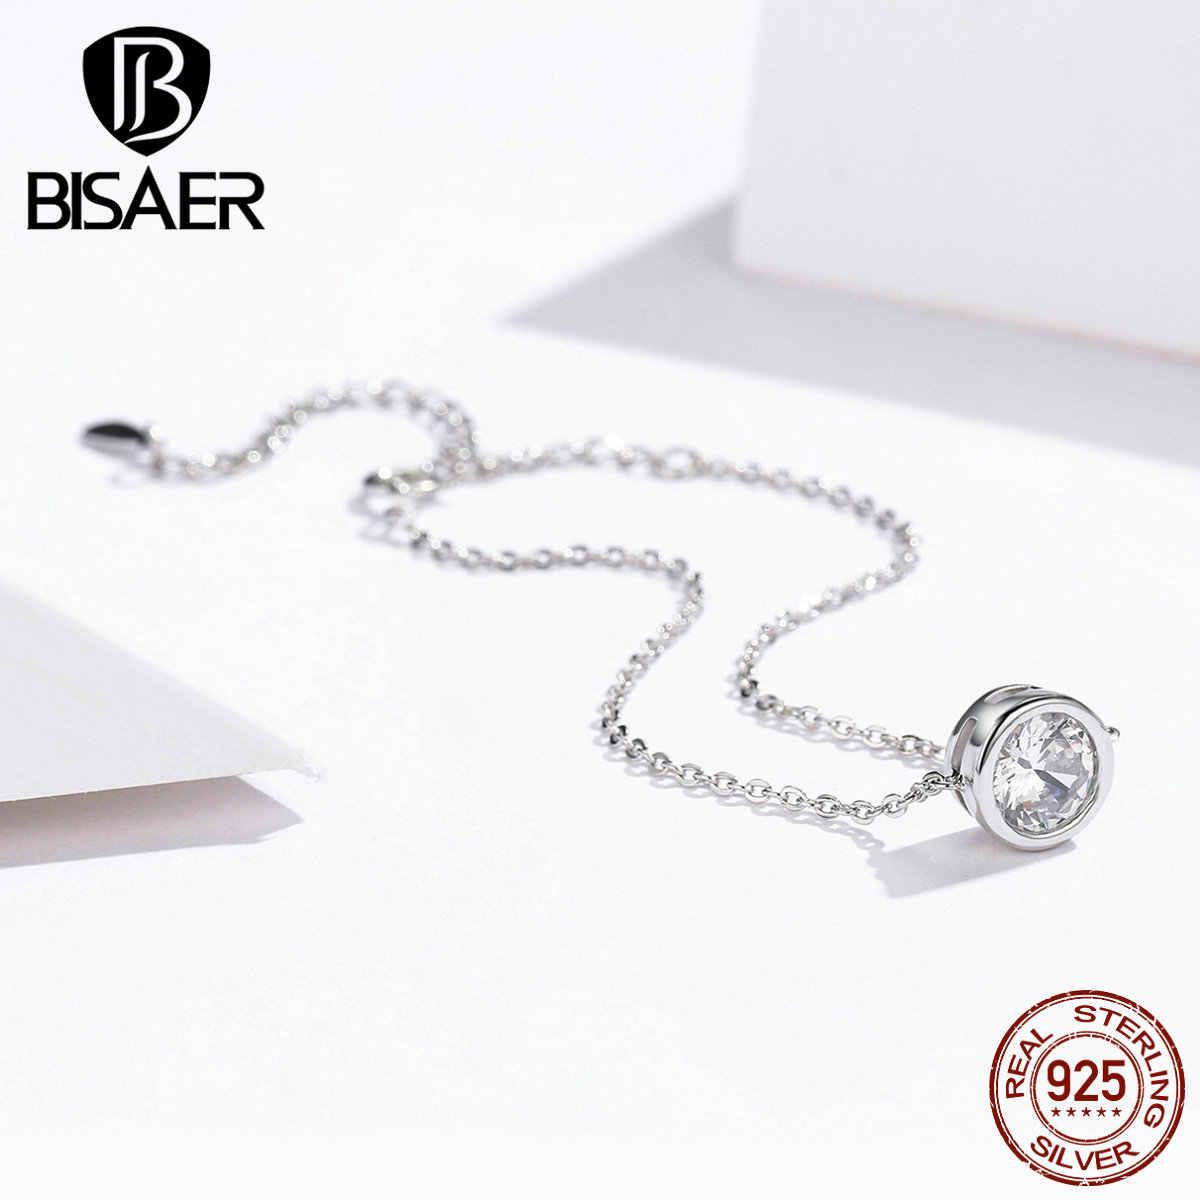 Bisaer pulseiras de prata, pulseiras de prata esterlina 925, círculo redondo, corrente feminina, bracelete de lagosta, joia de prata esterlina ecb157